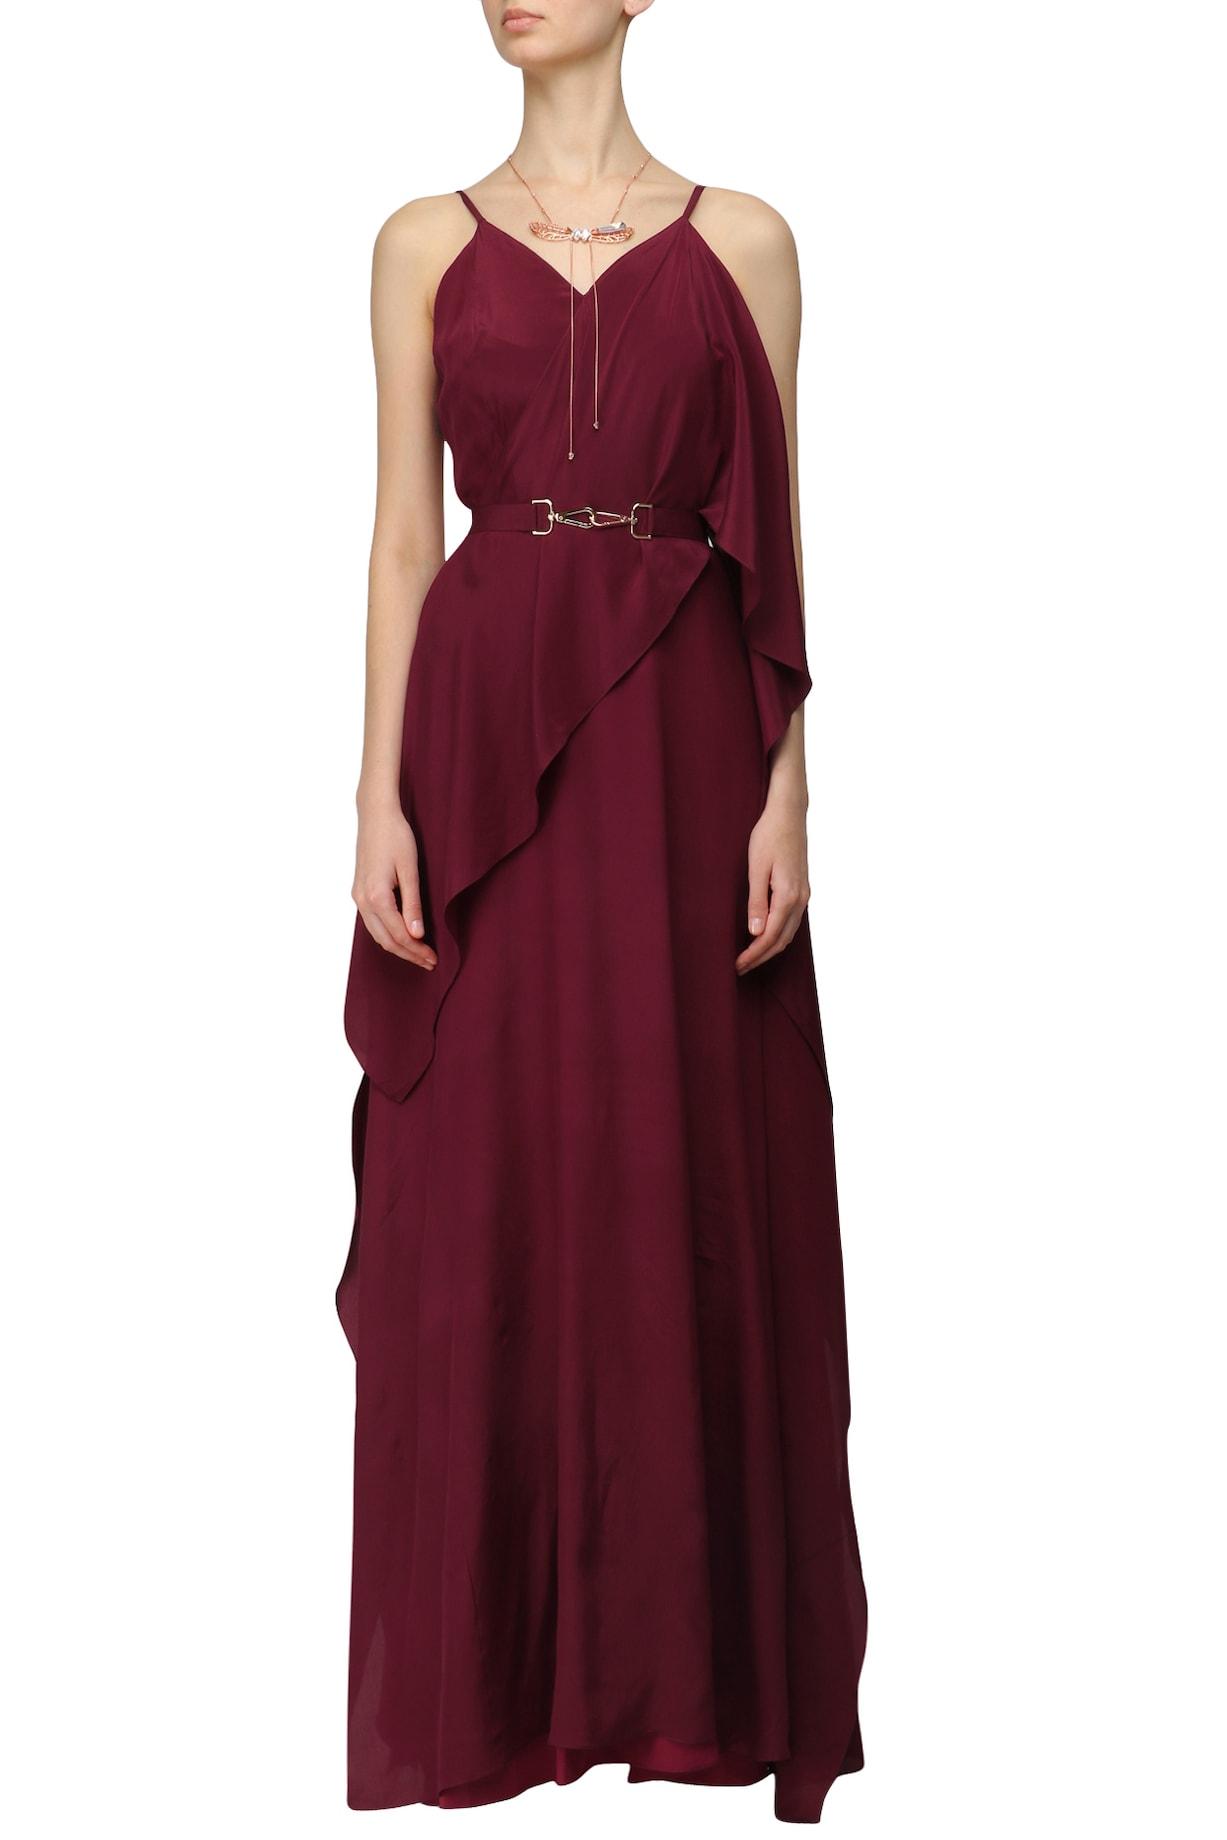 LOLA by Suman B Dresses